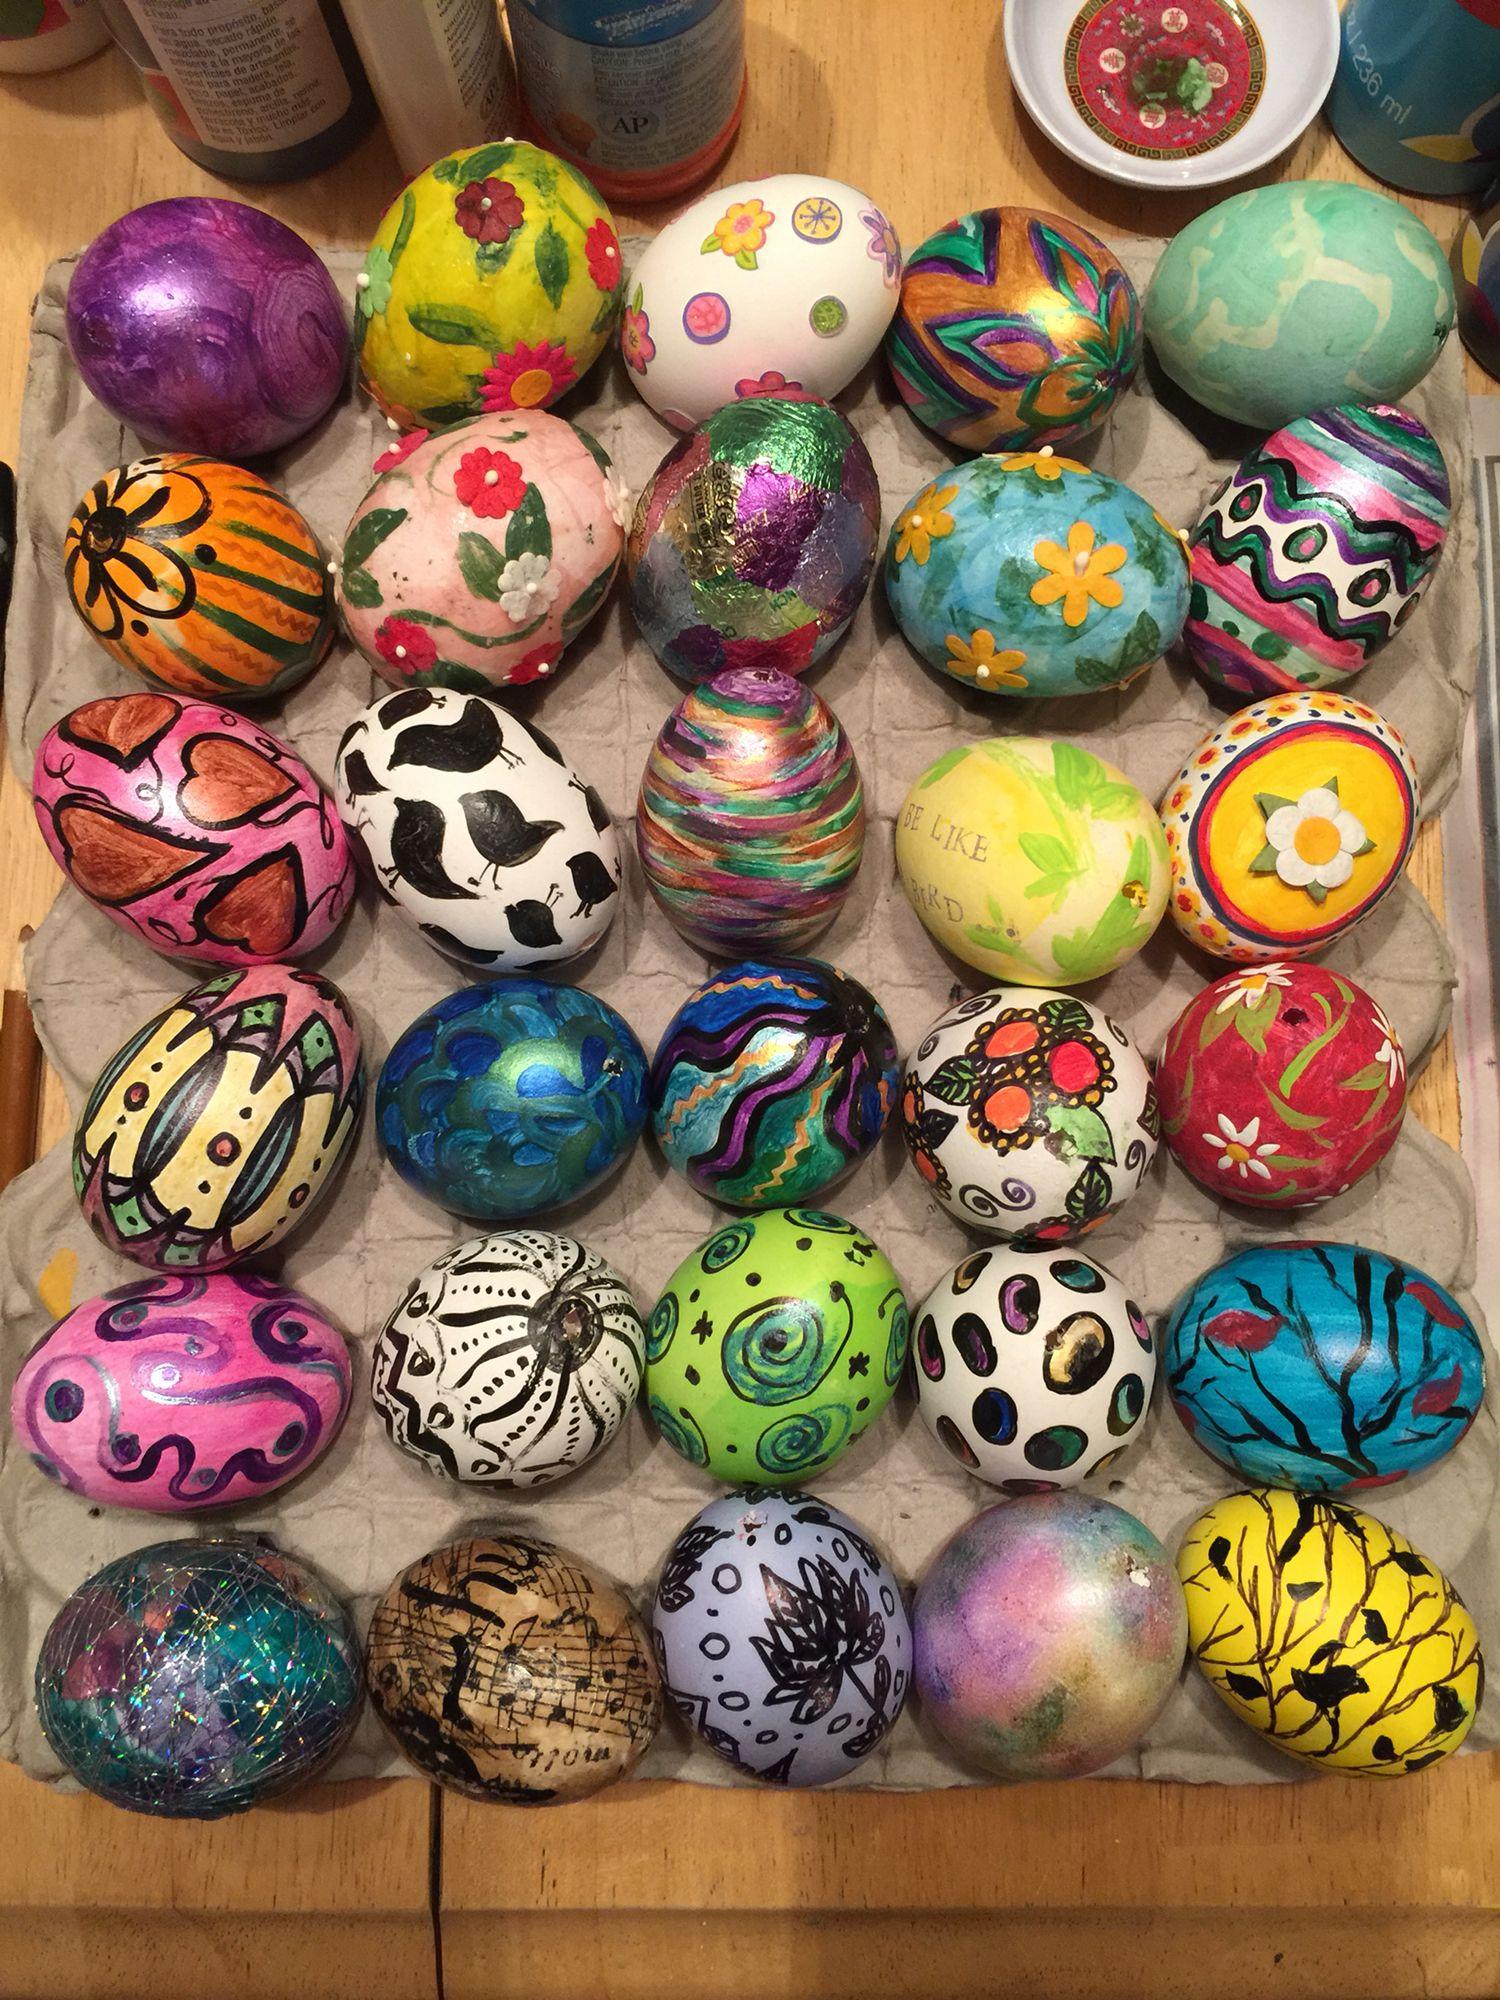 Arty eggs!!